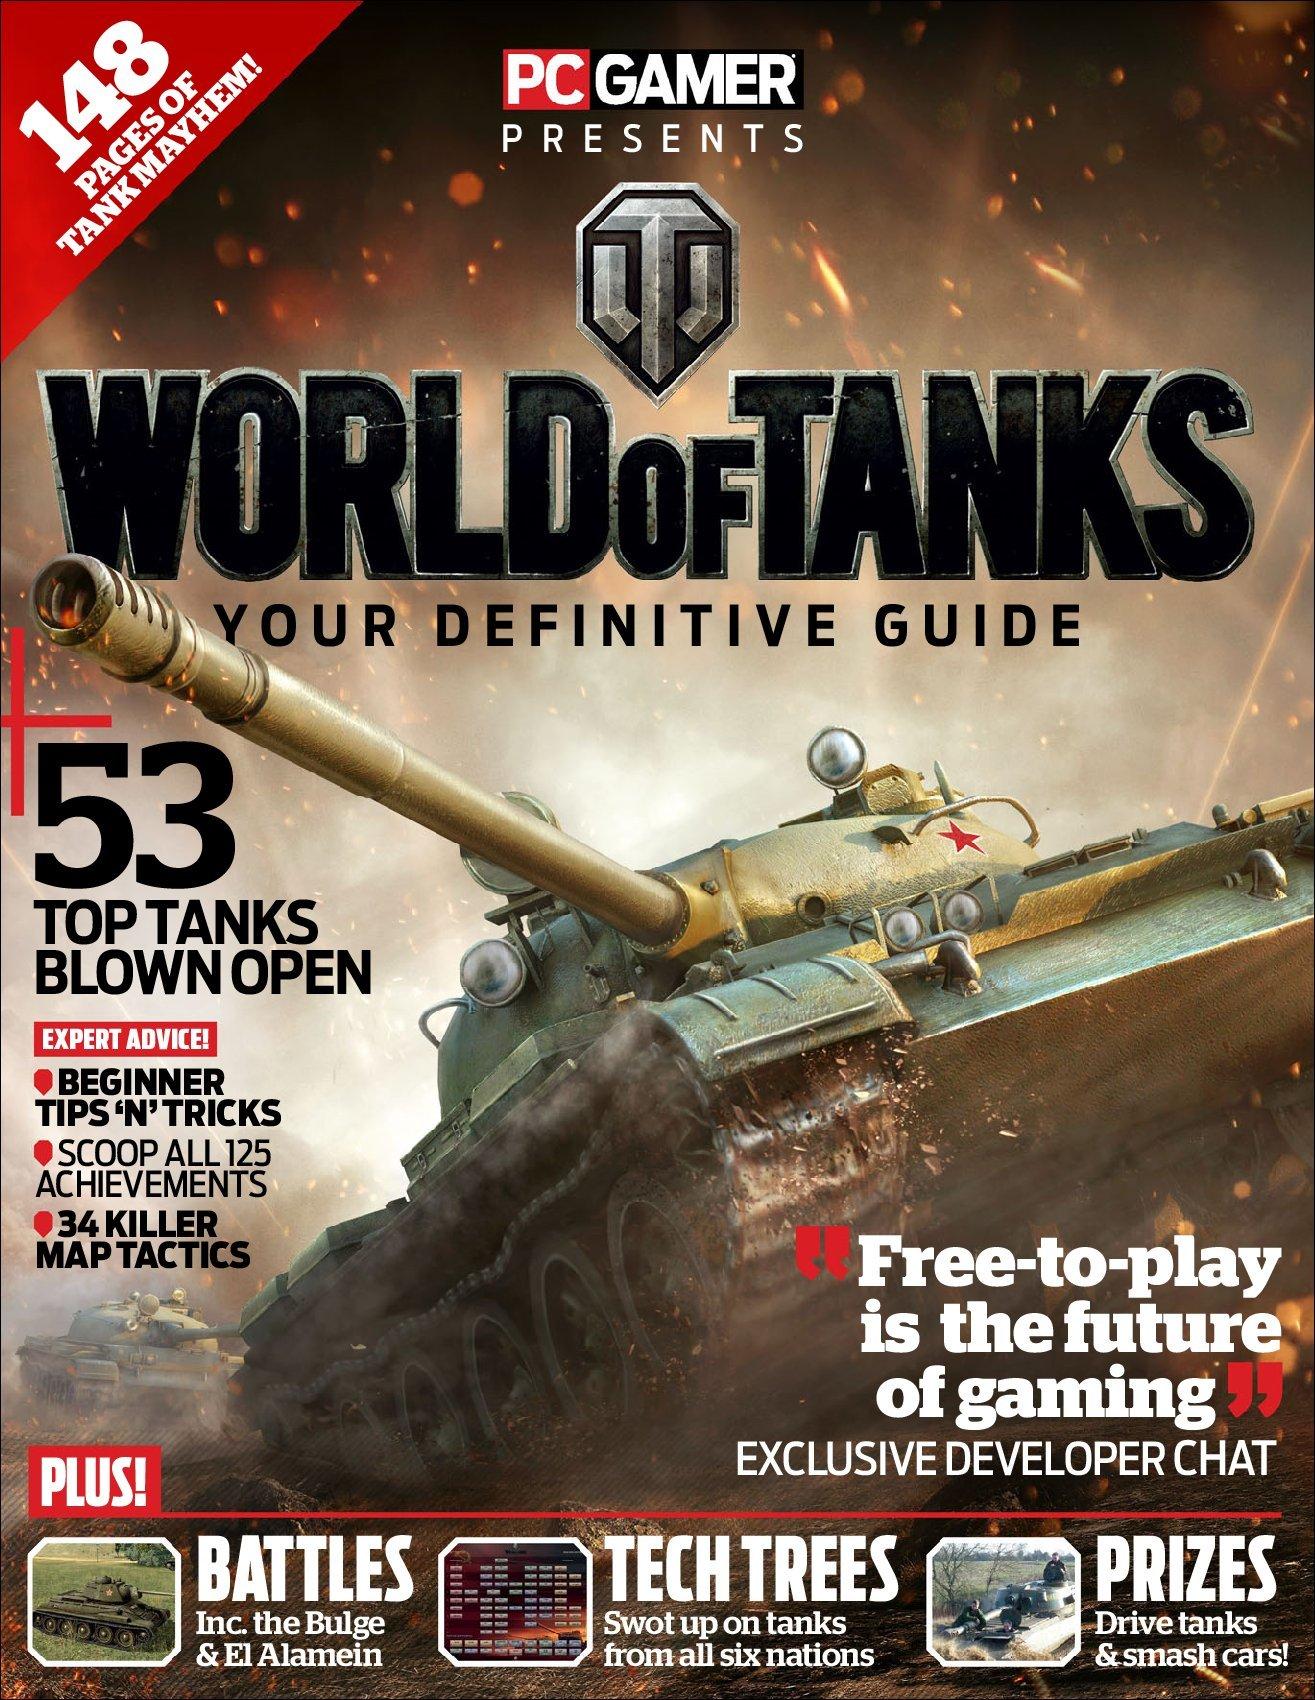 PC Gamer Presents World of Tanks Digital